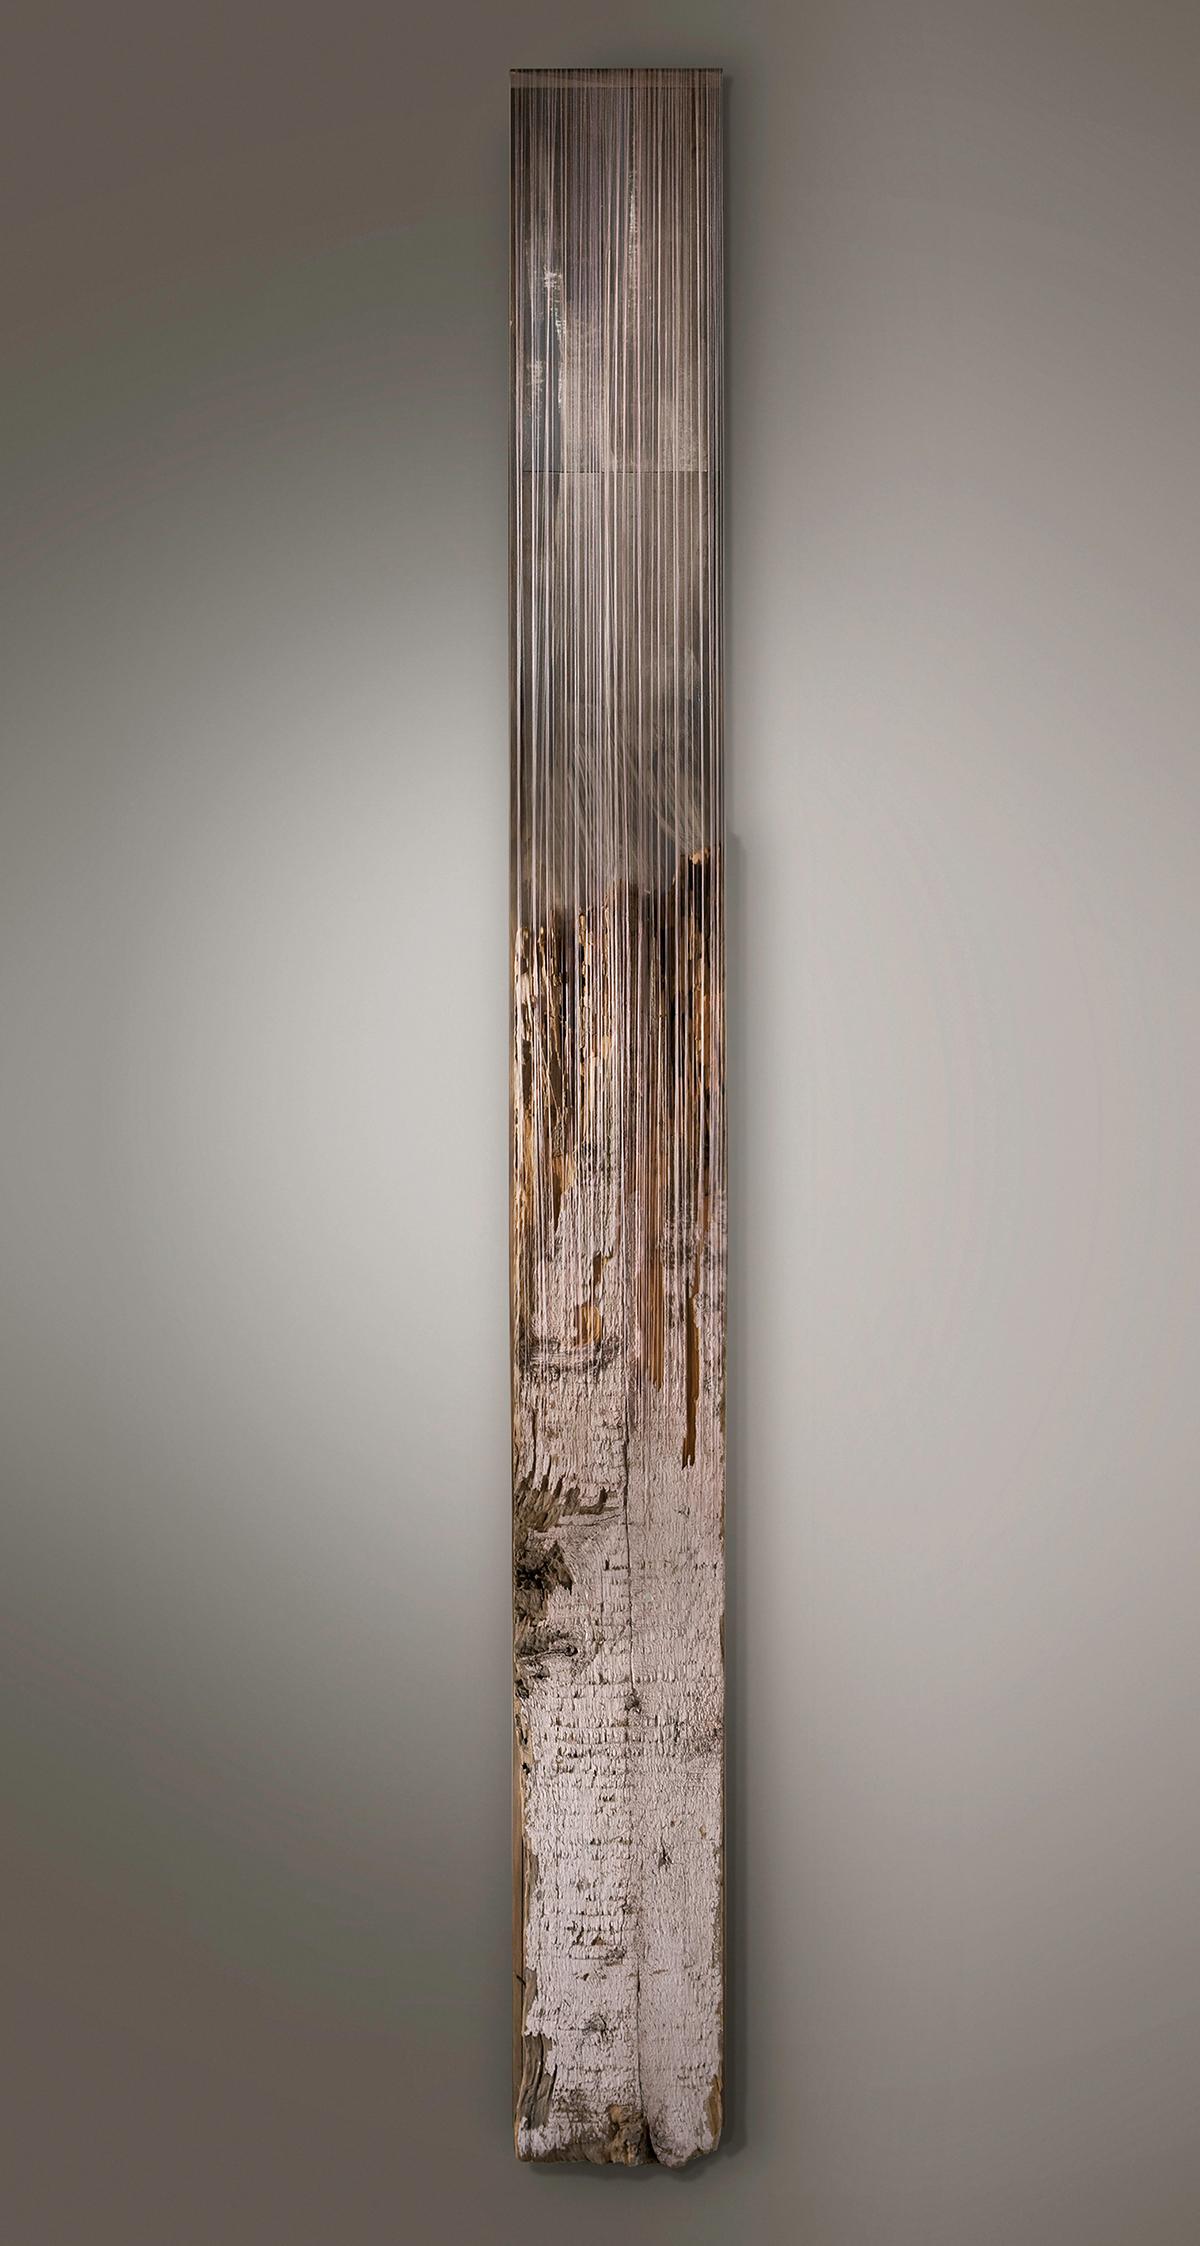 TOWARD APRIL   Found wood, acrylic wash, paper, thread  92 x 10 x 4.5 Inches